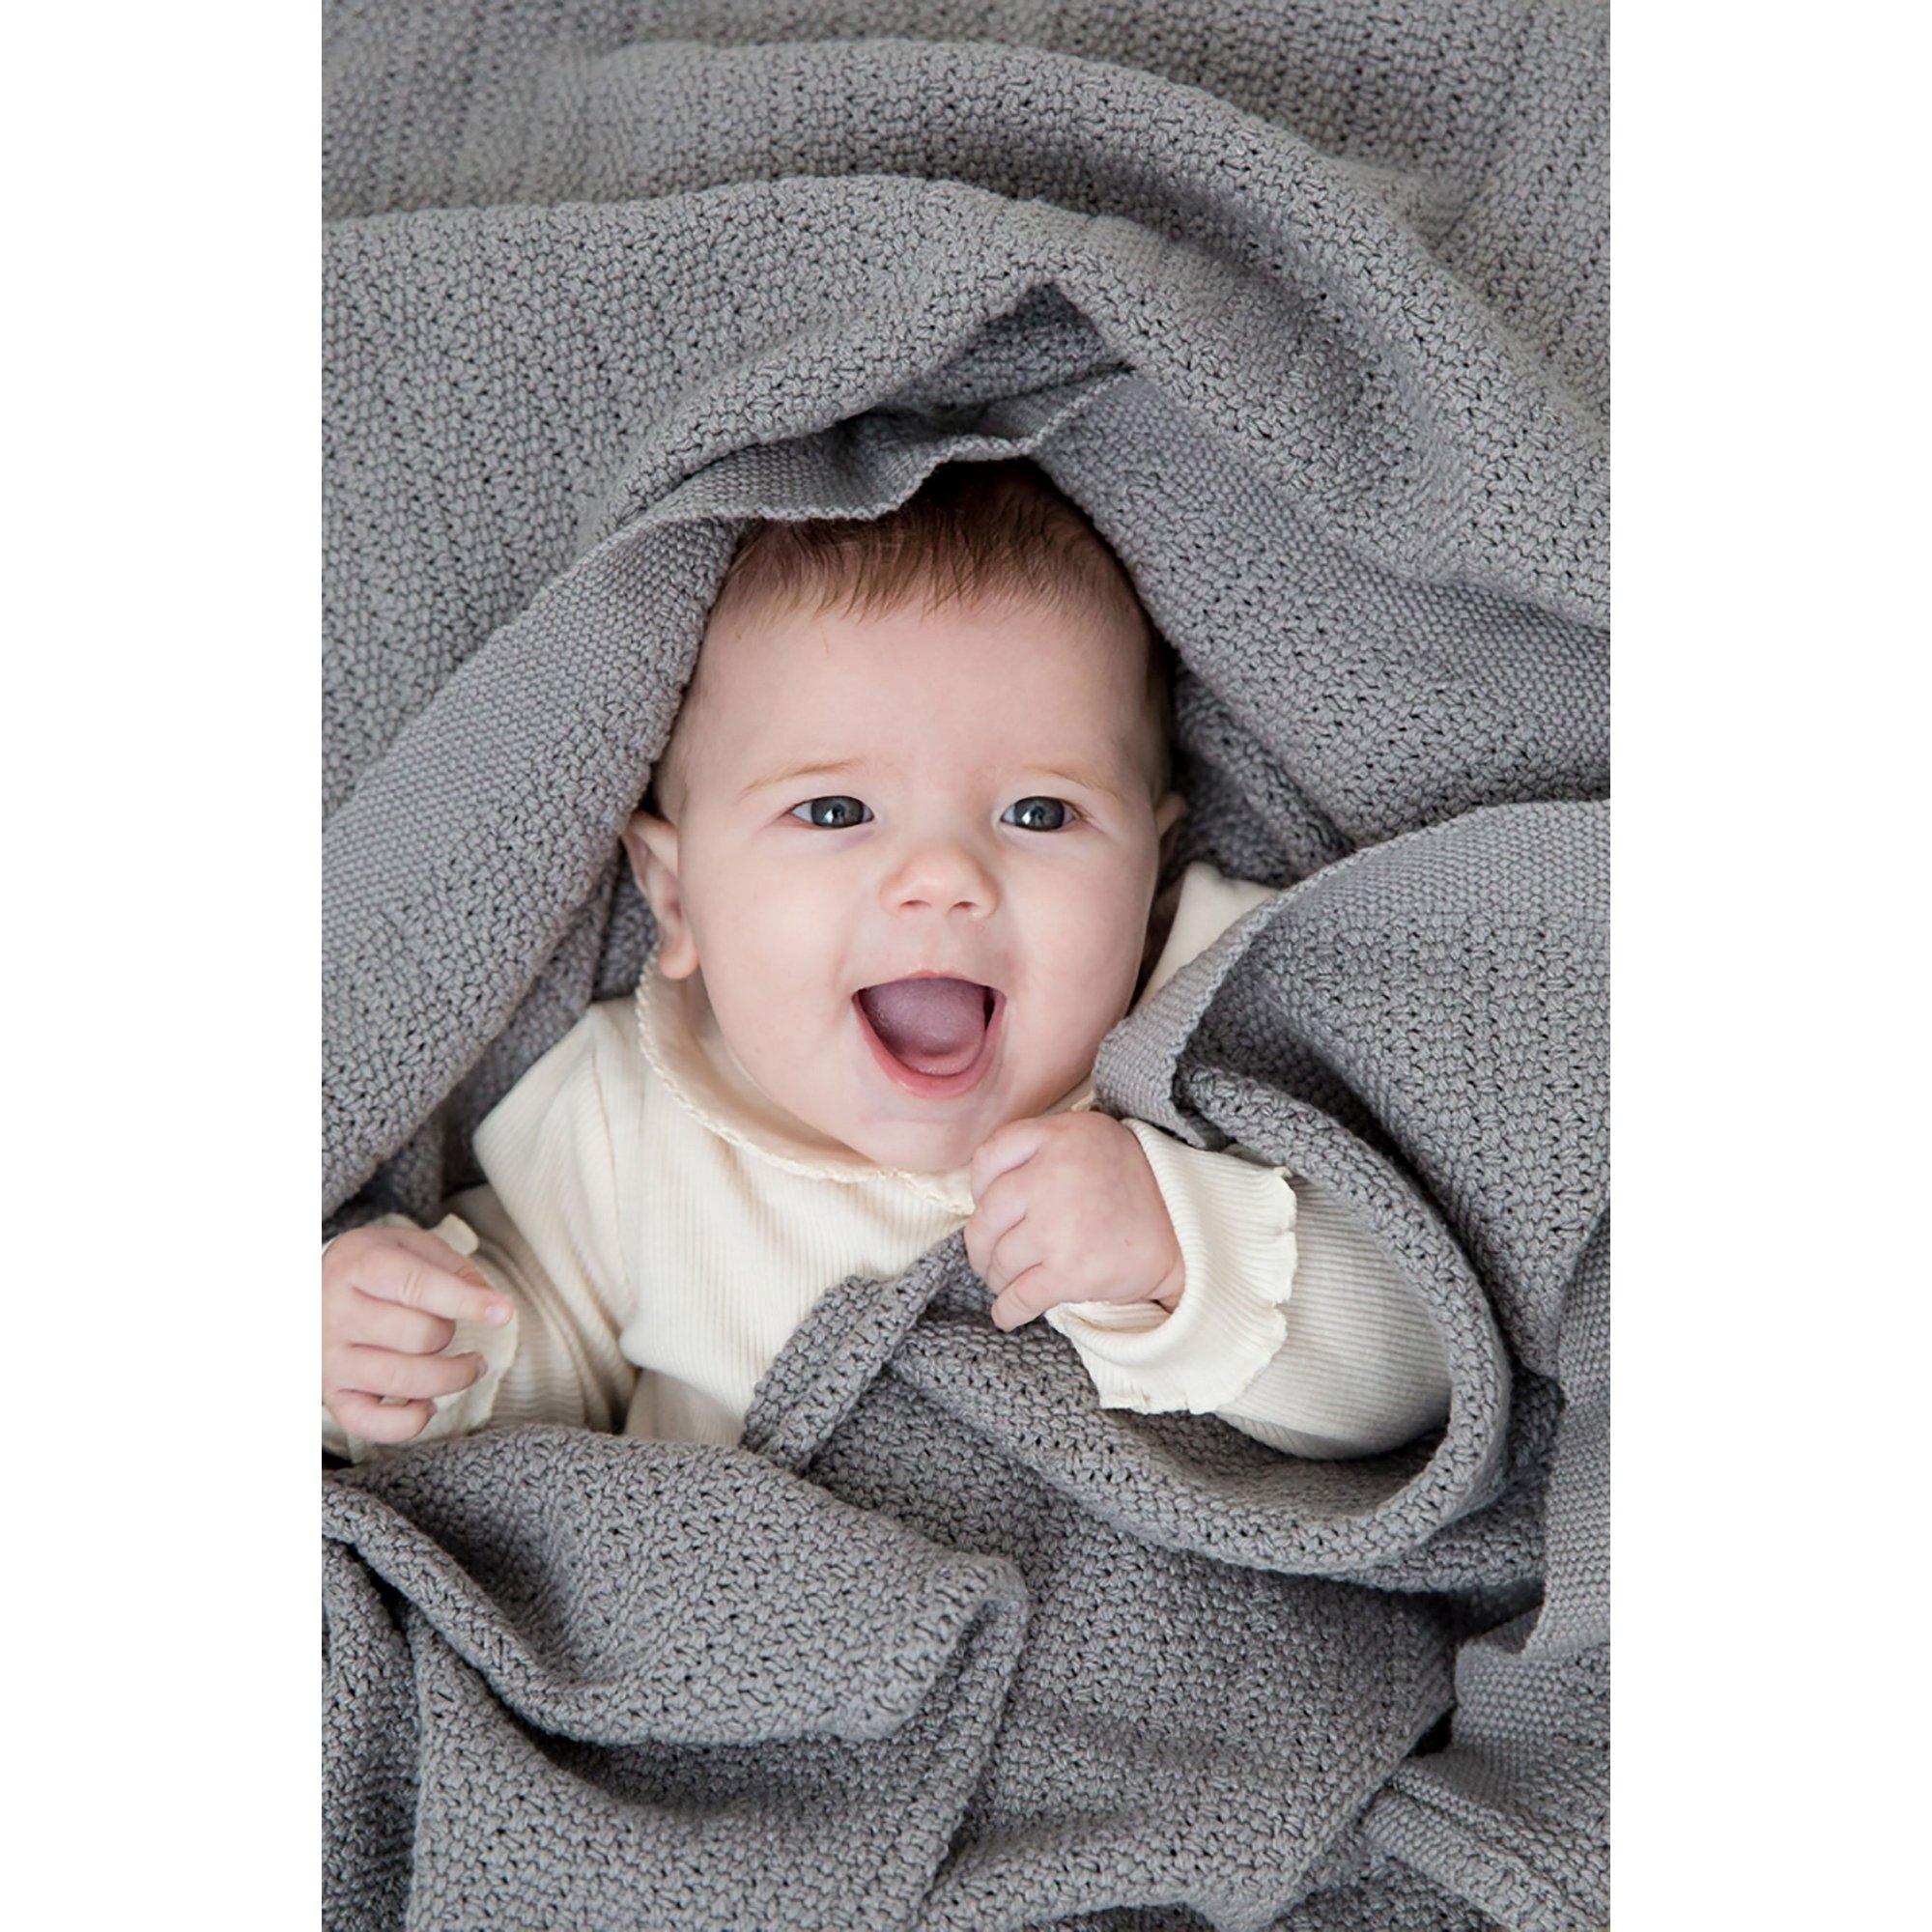 Image of Hippychick Cellular Baby Blanket - Slate Grey